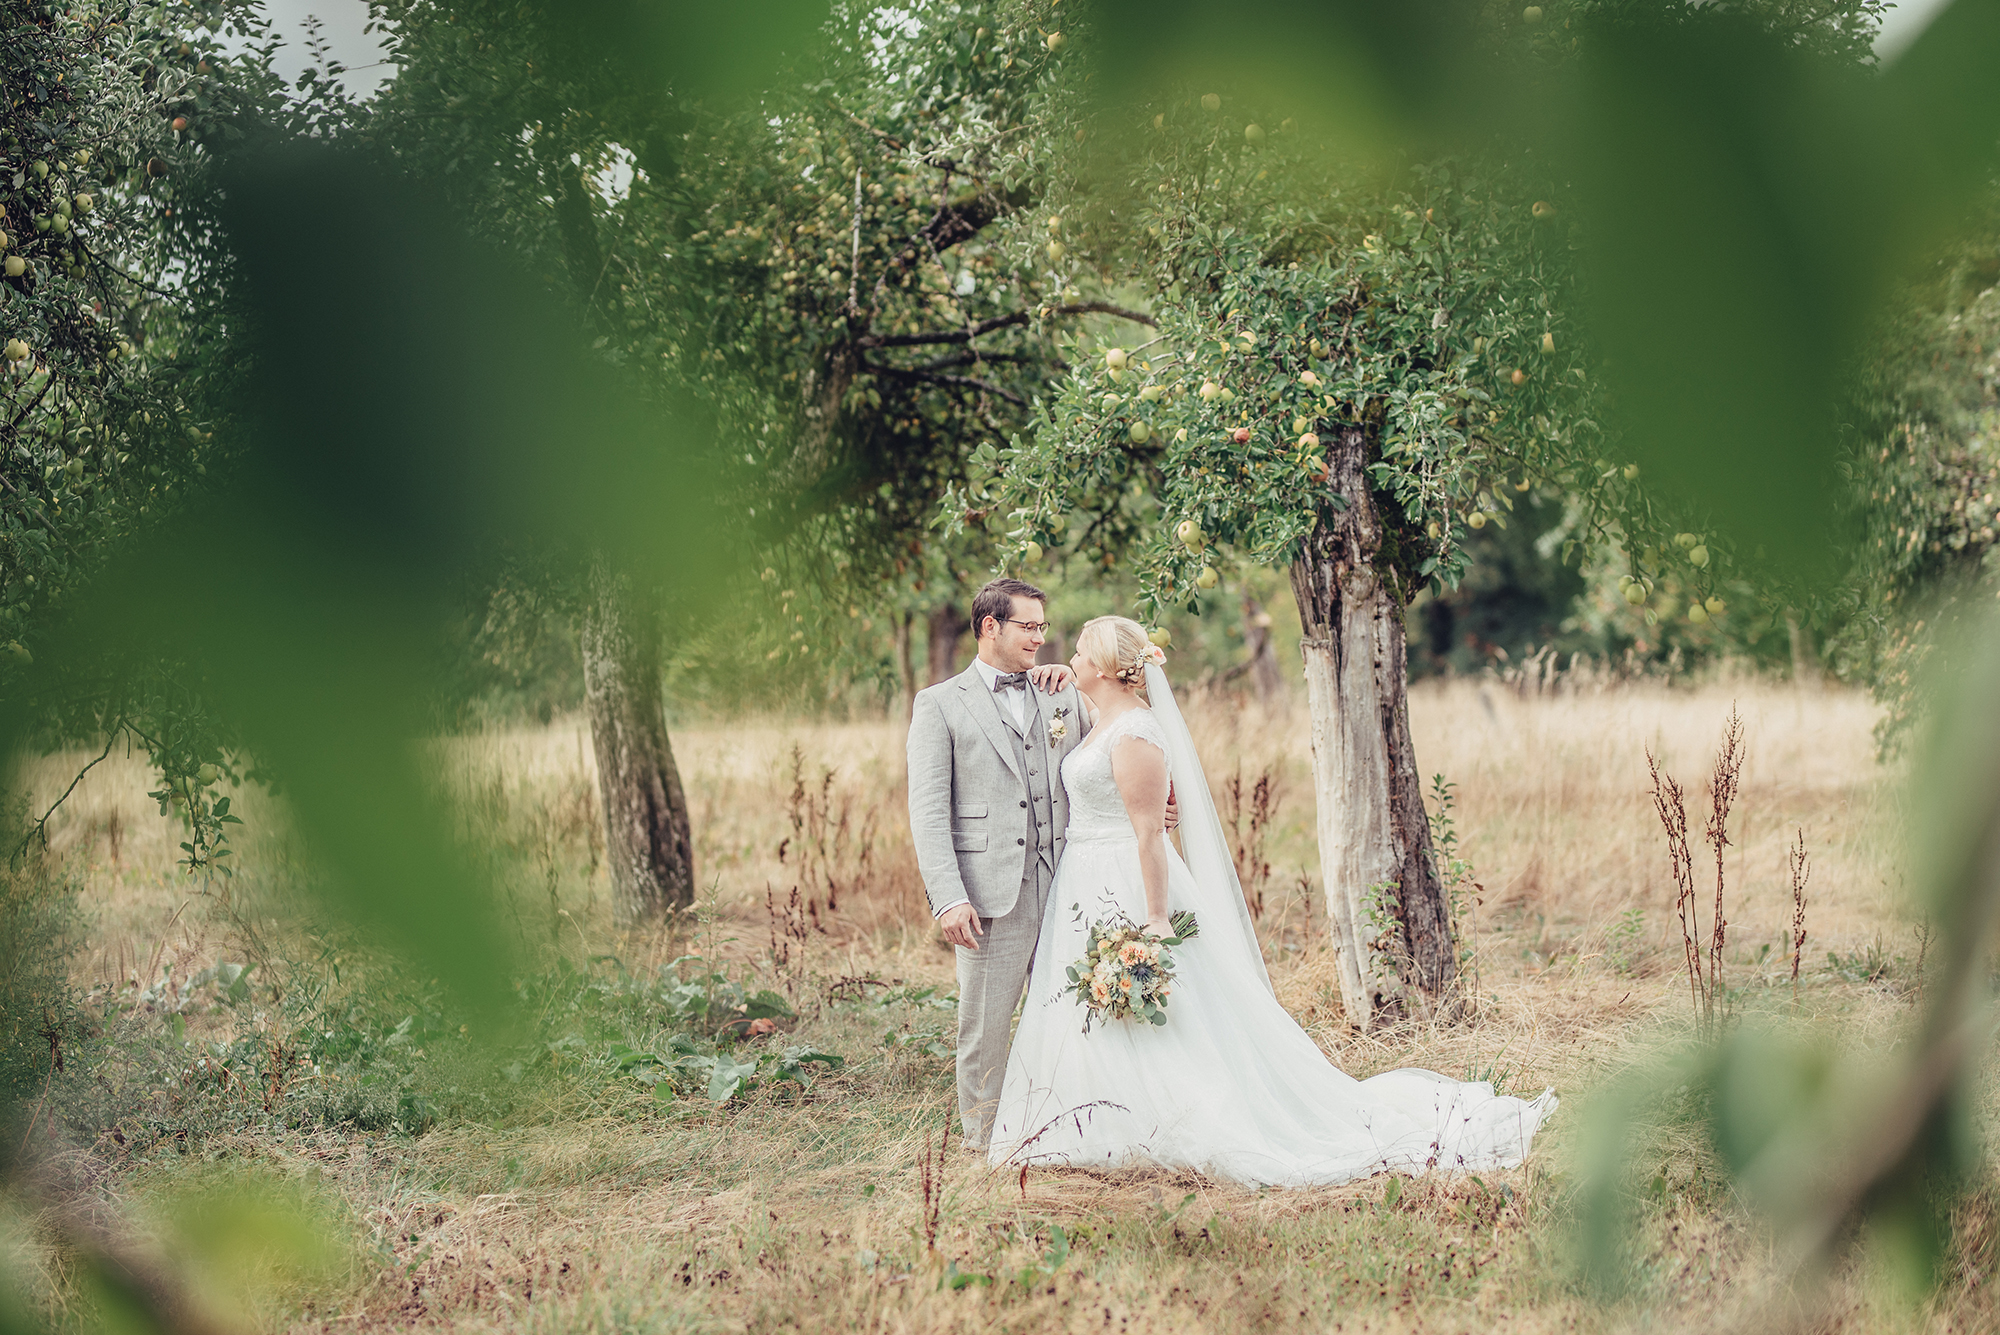 weddingseptemberluminoxx92348234199